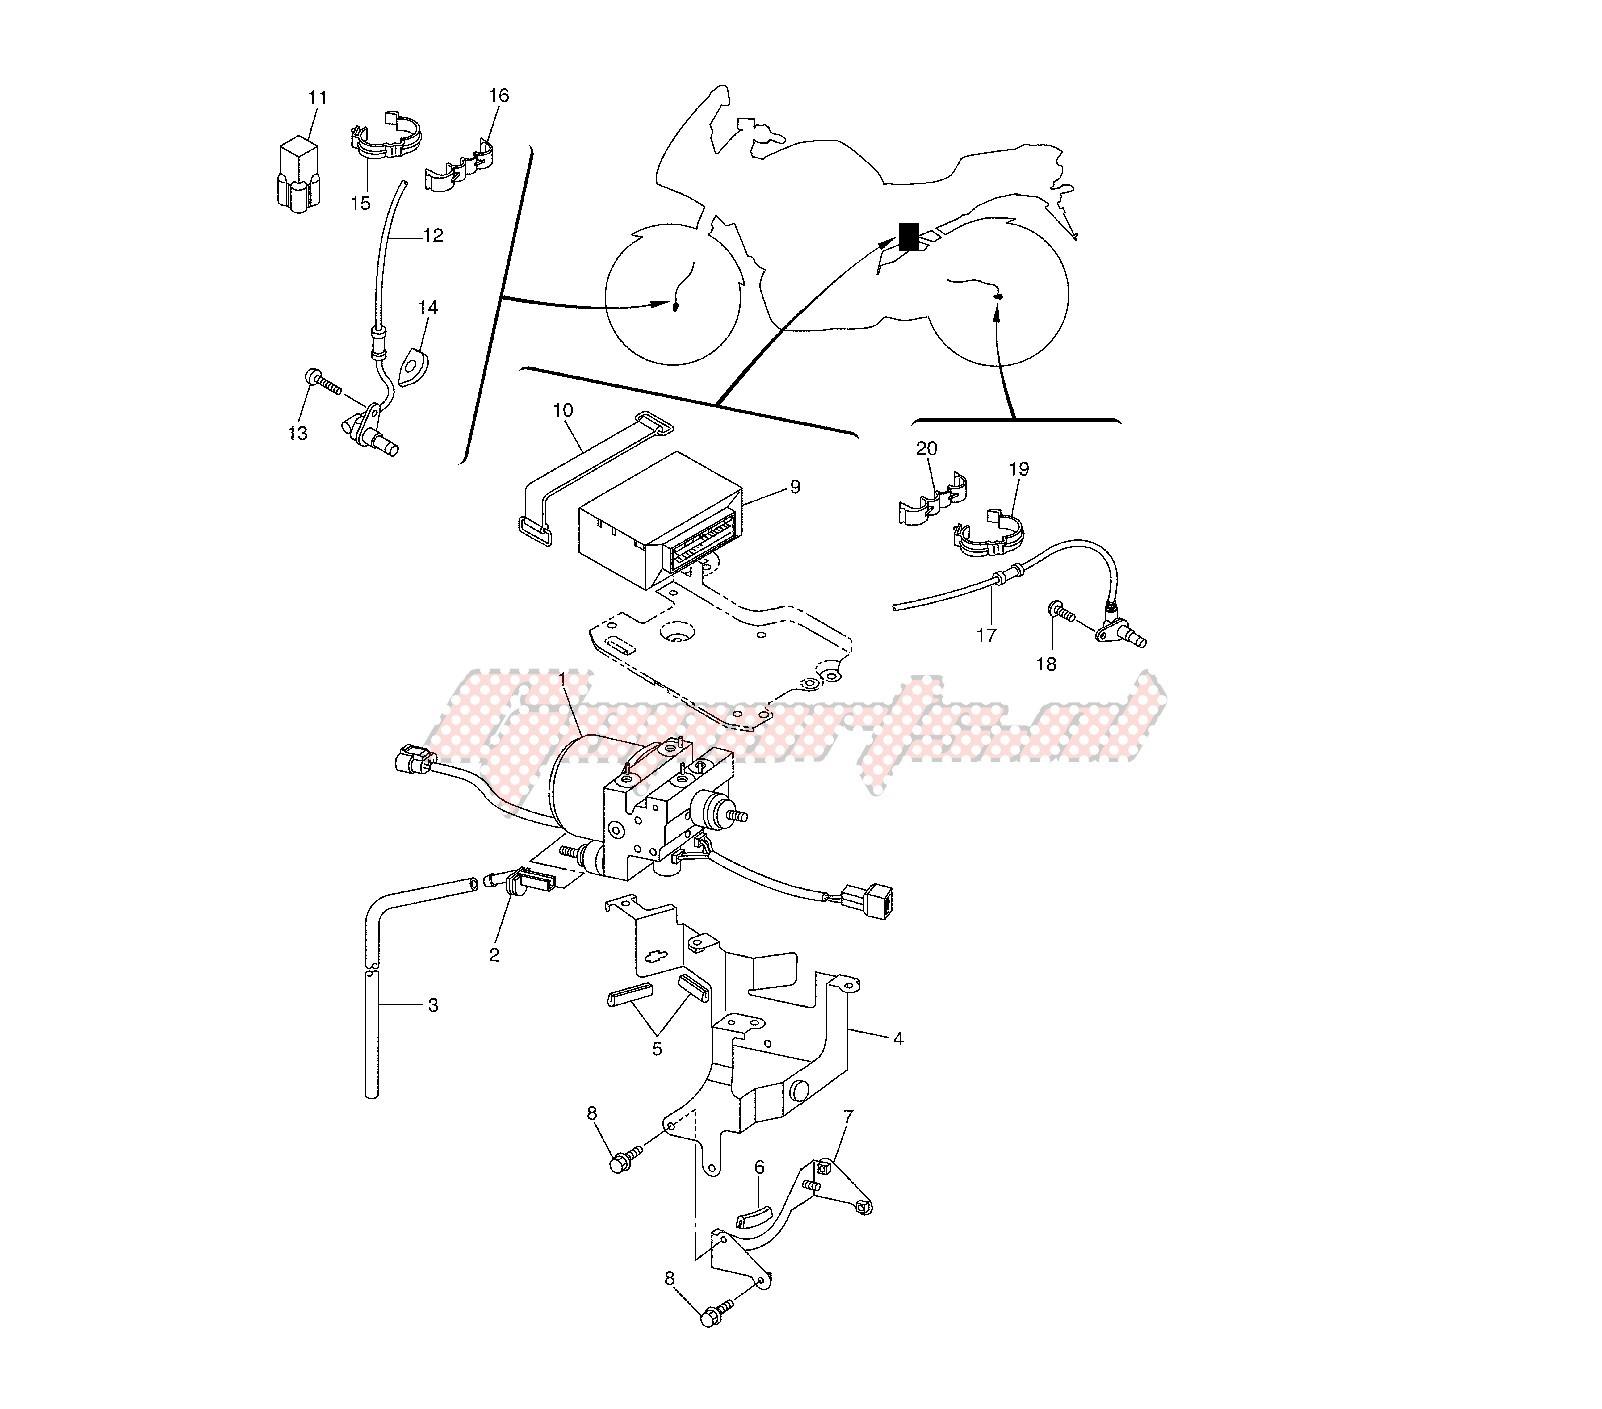 Abs System Diagrm Oem Anti Lock Brake System Yamaha [motorcycle] Fz6 Fazer Of Abs System Diagrm